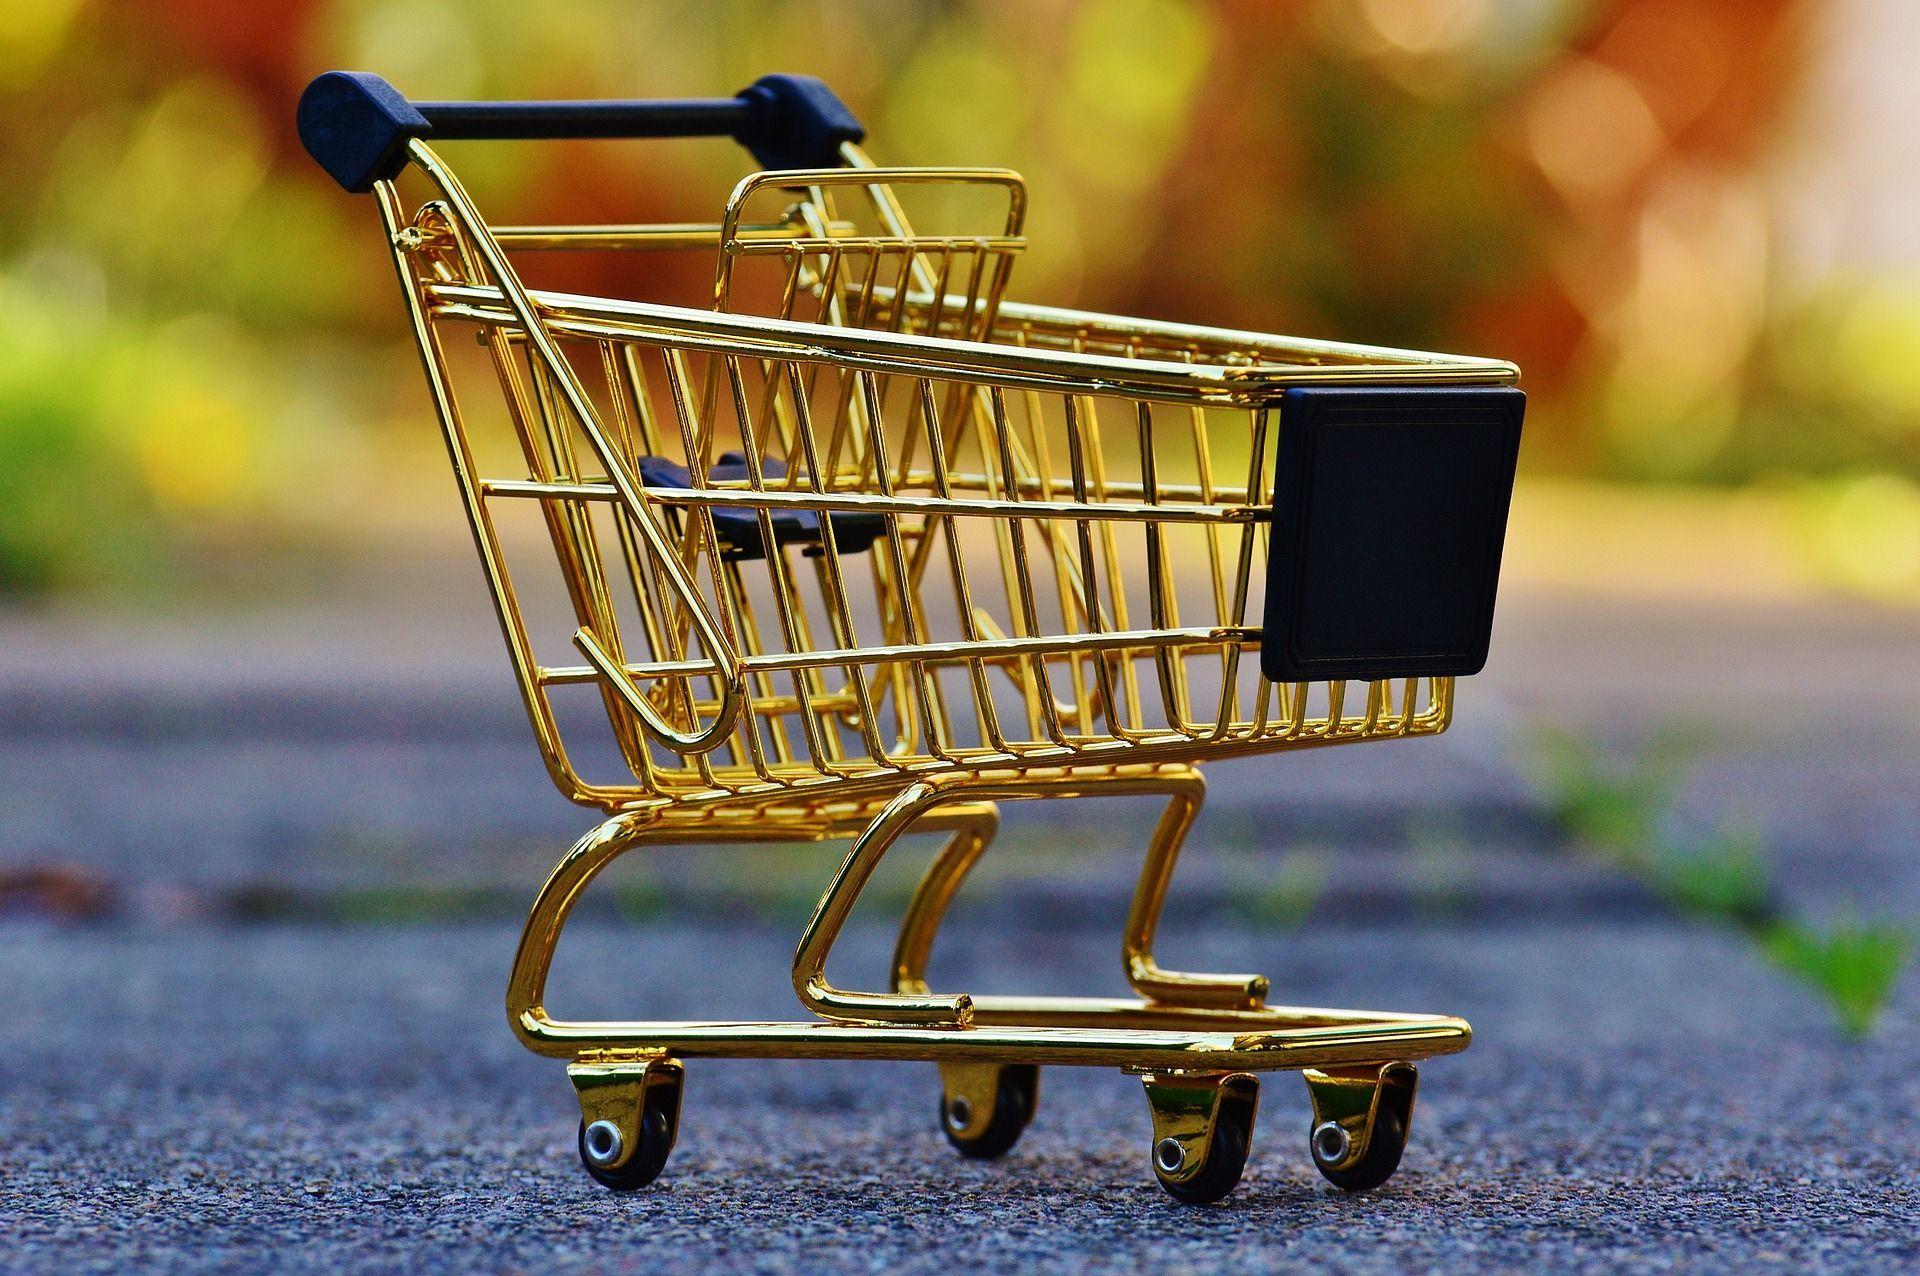 Einkaufen & Service | CityKit